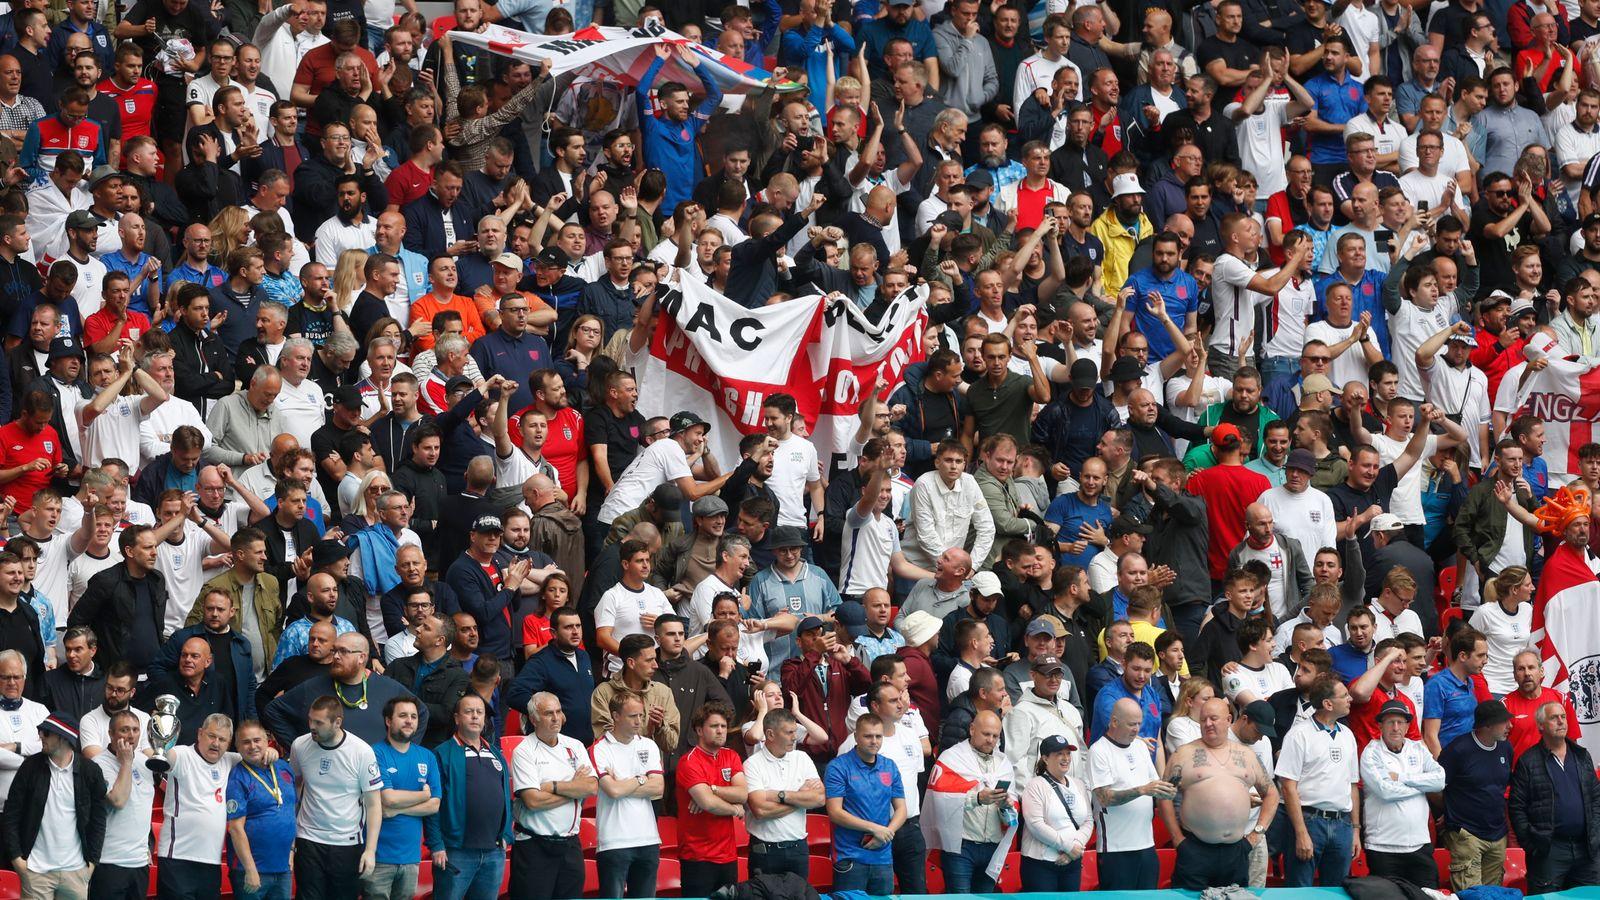 Euro 2020: Don't go to Rome for quarter-final against Ukraine, England fans warned